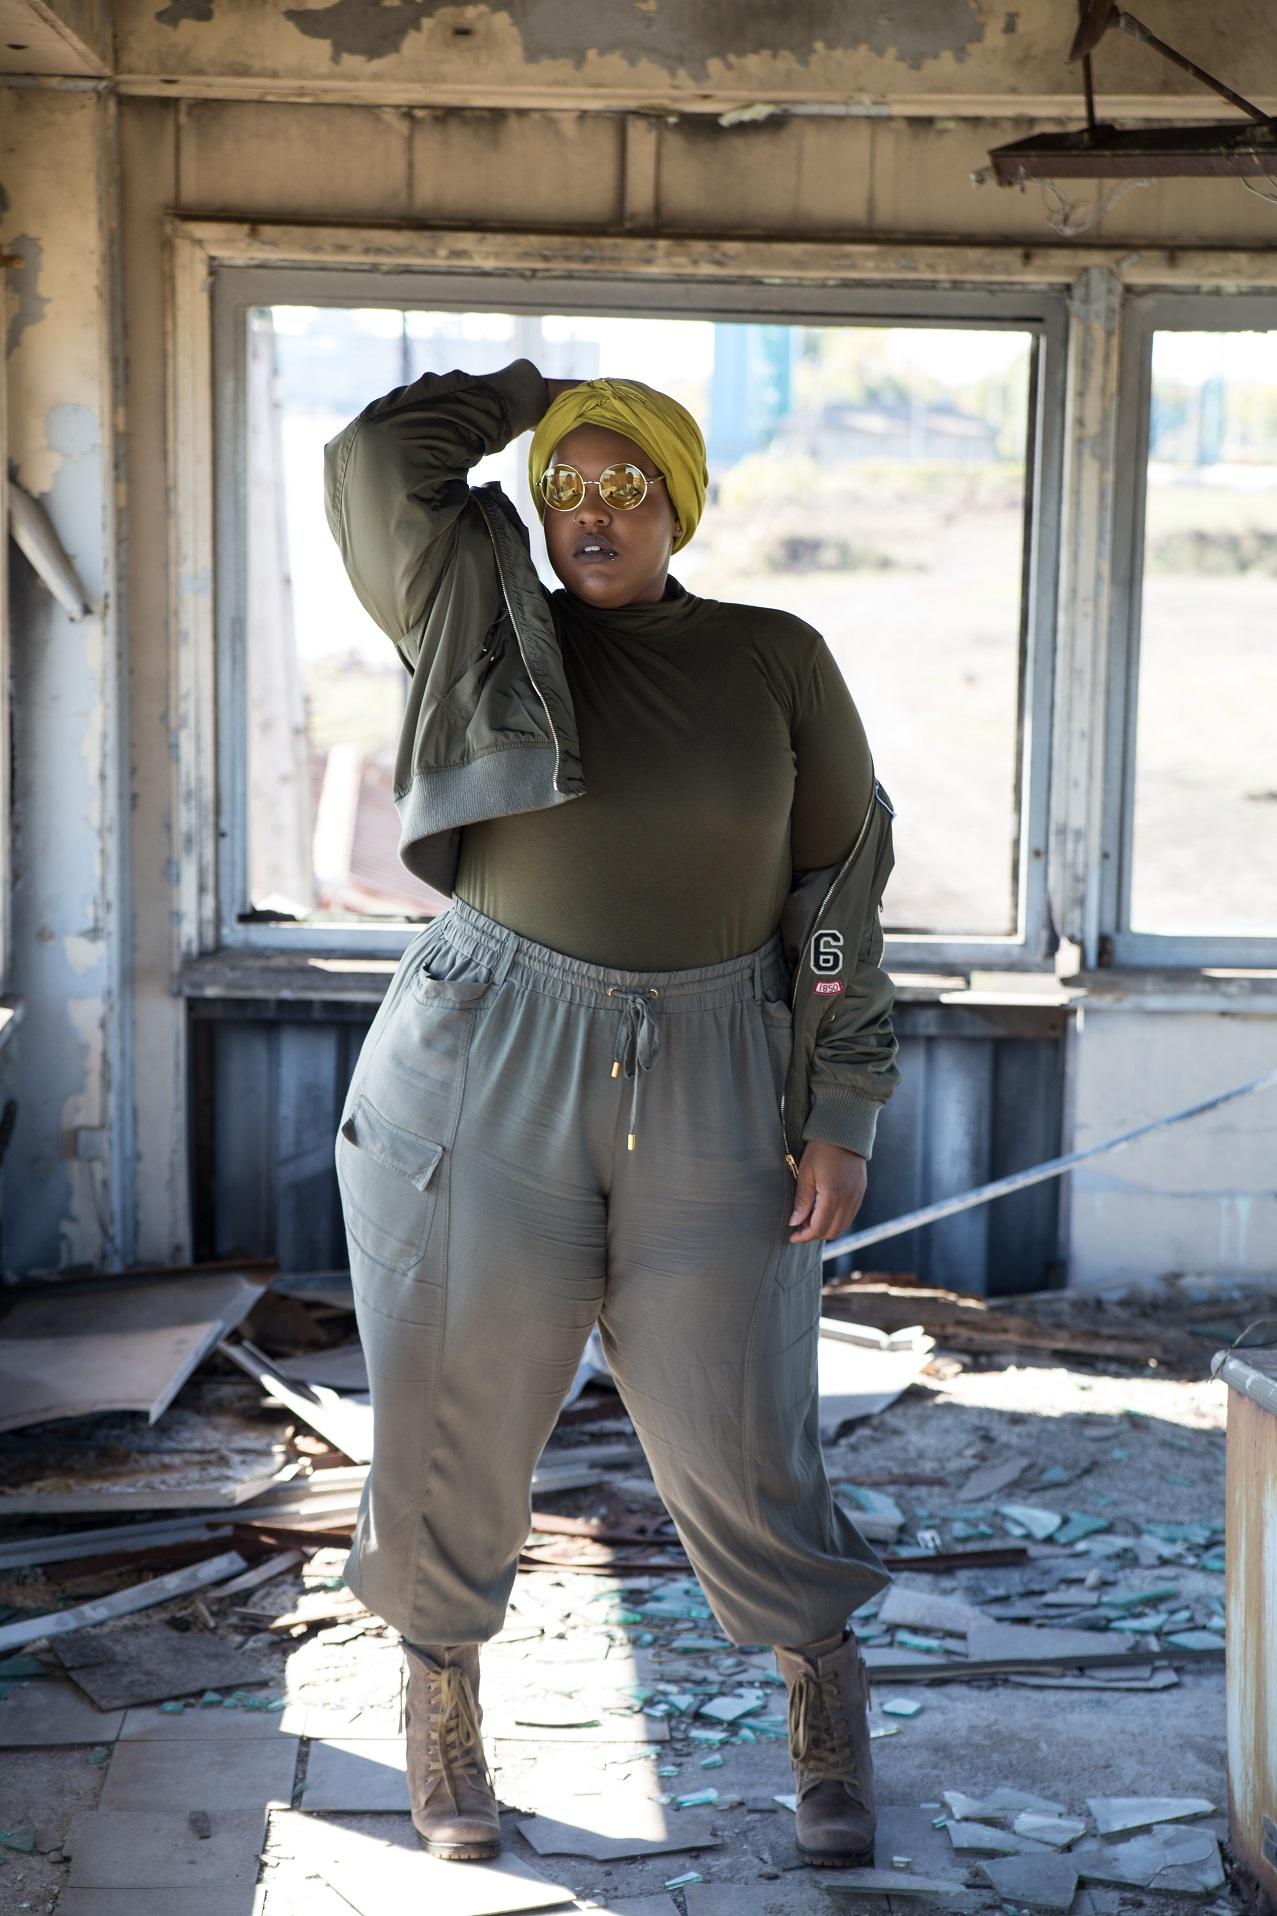 Leah-Vernon-Muslim-Girl-Plus-Size-Model-Body-Positive-Detroit-1.jpg